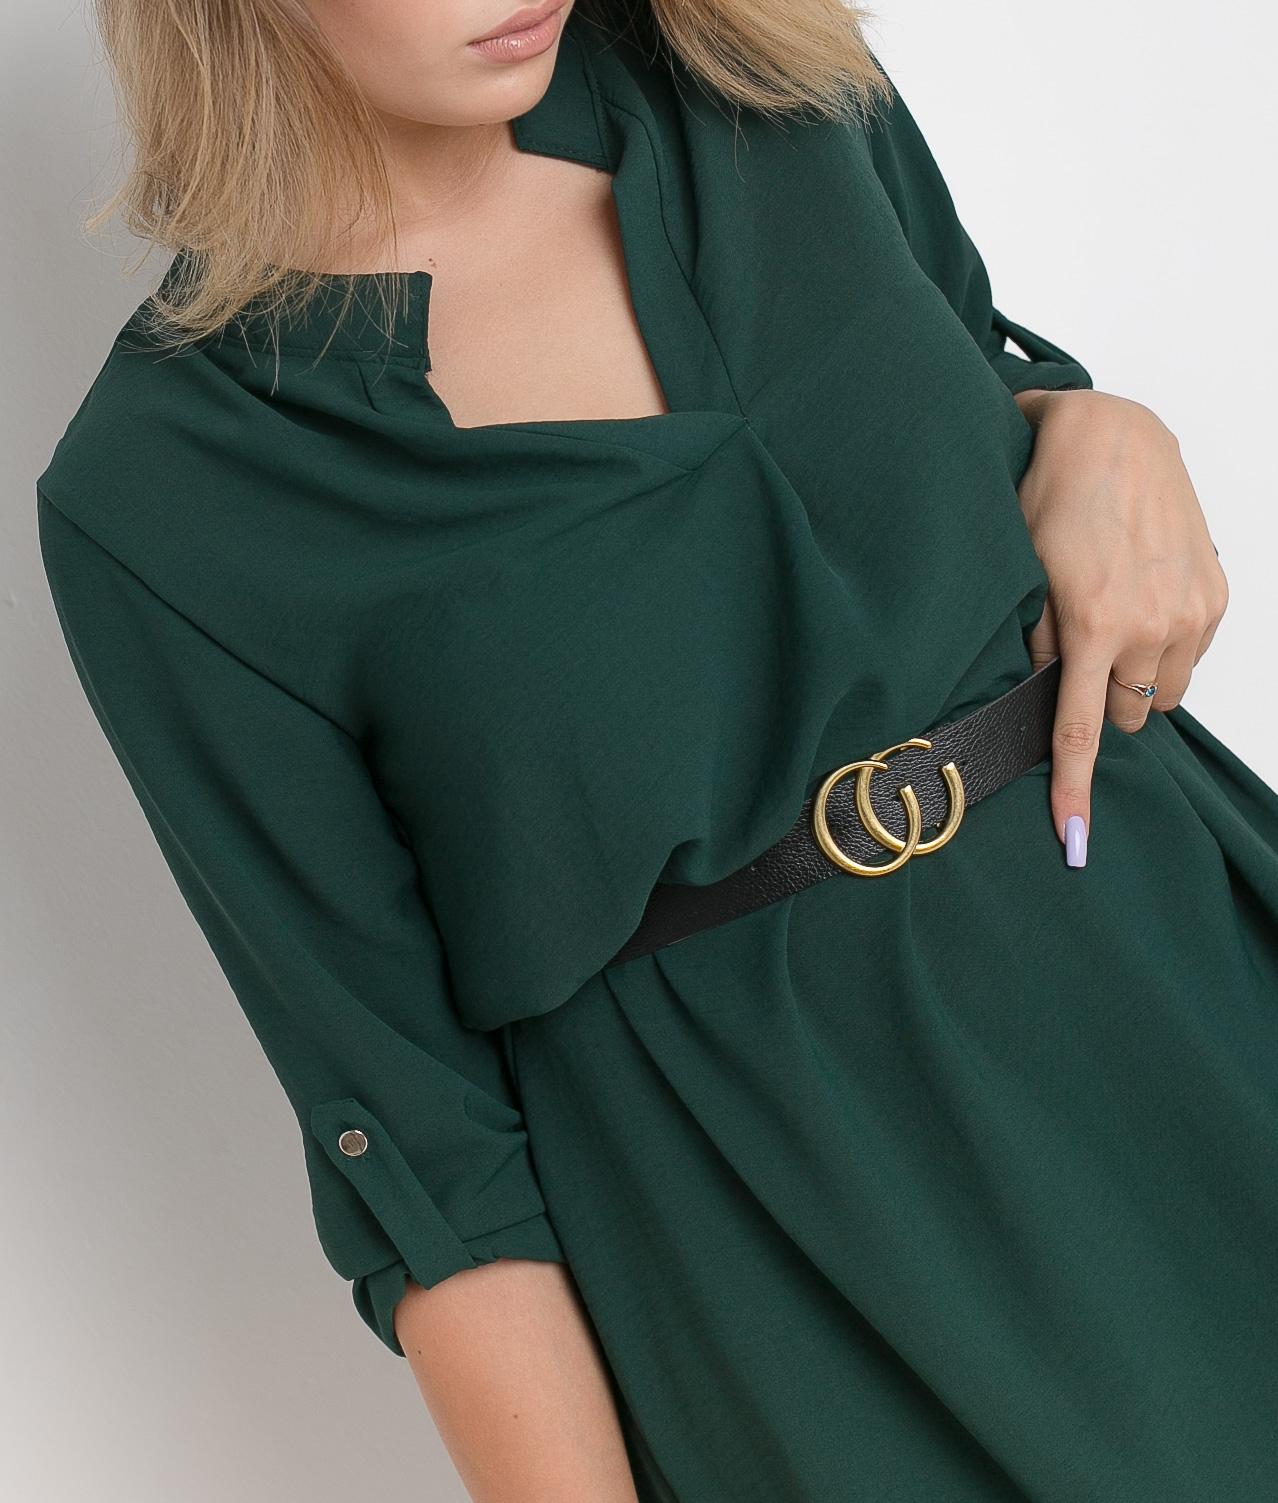 KURIA DRESS - GREEN